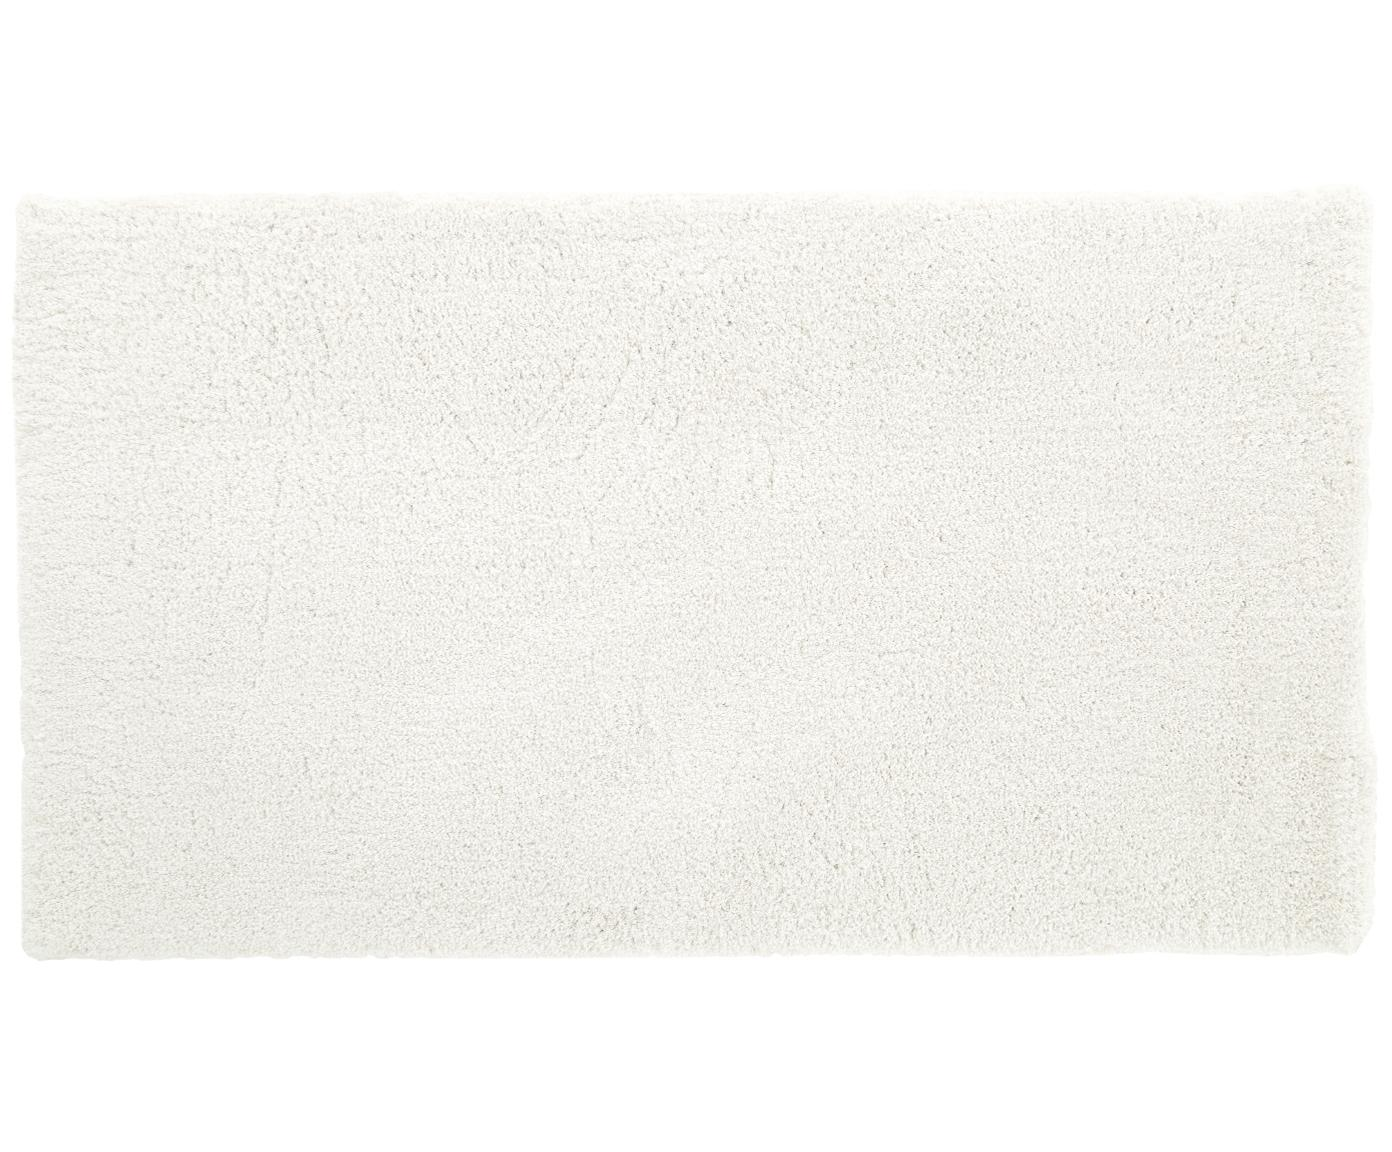 Alfombra mullida de pelo largo Leighton, Parte superior: 100%poliéster (microfibr, Reverso: 100%poliéster, Crema, An 80 x L 150 cm (Tamaño XS)